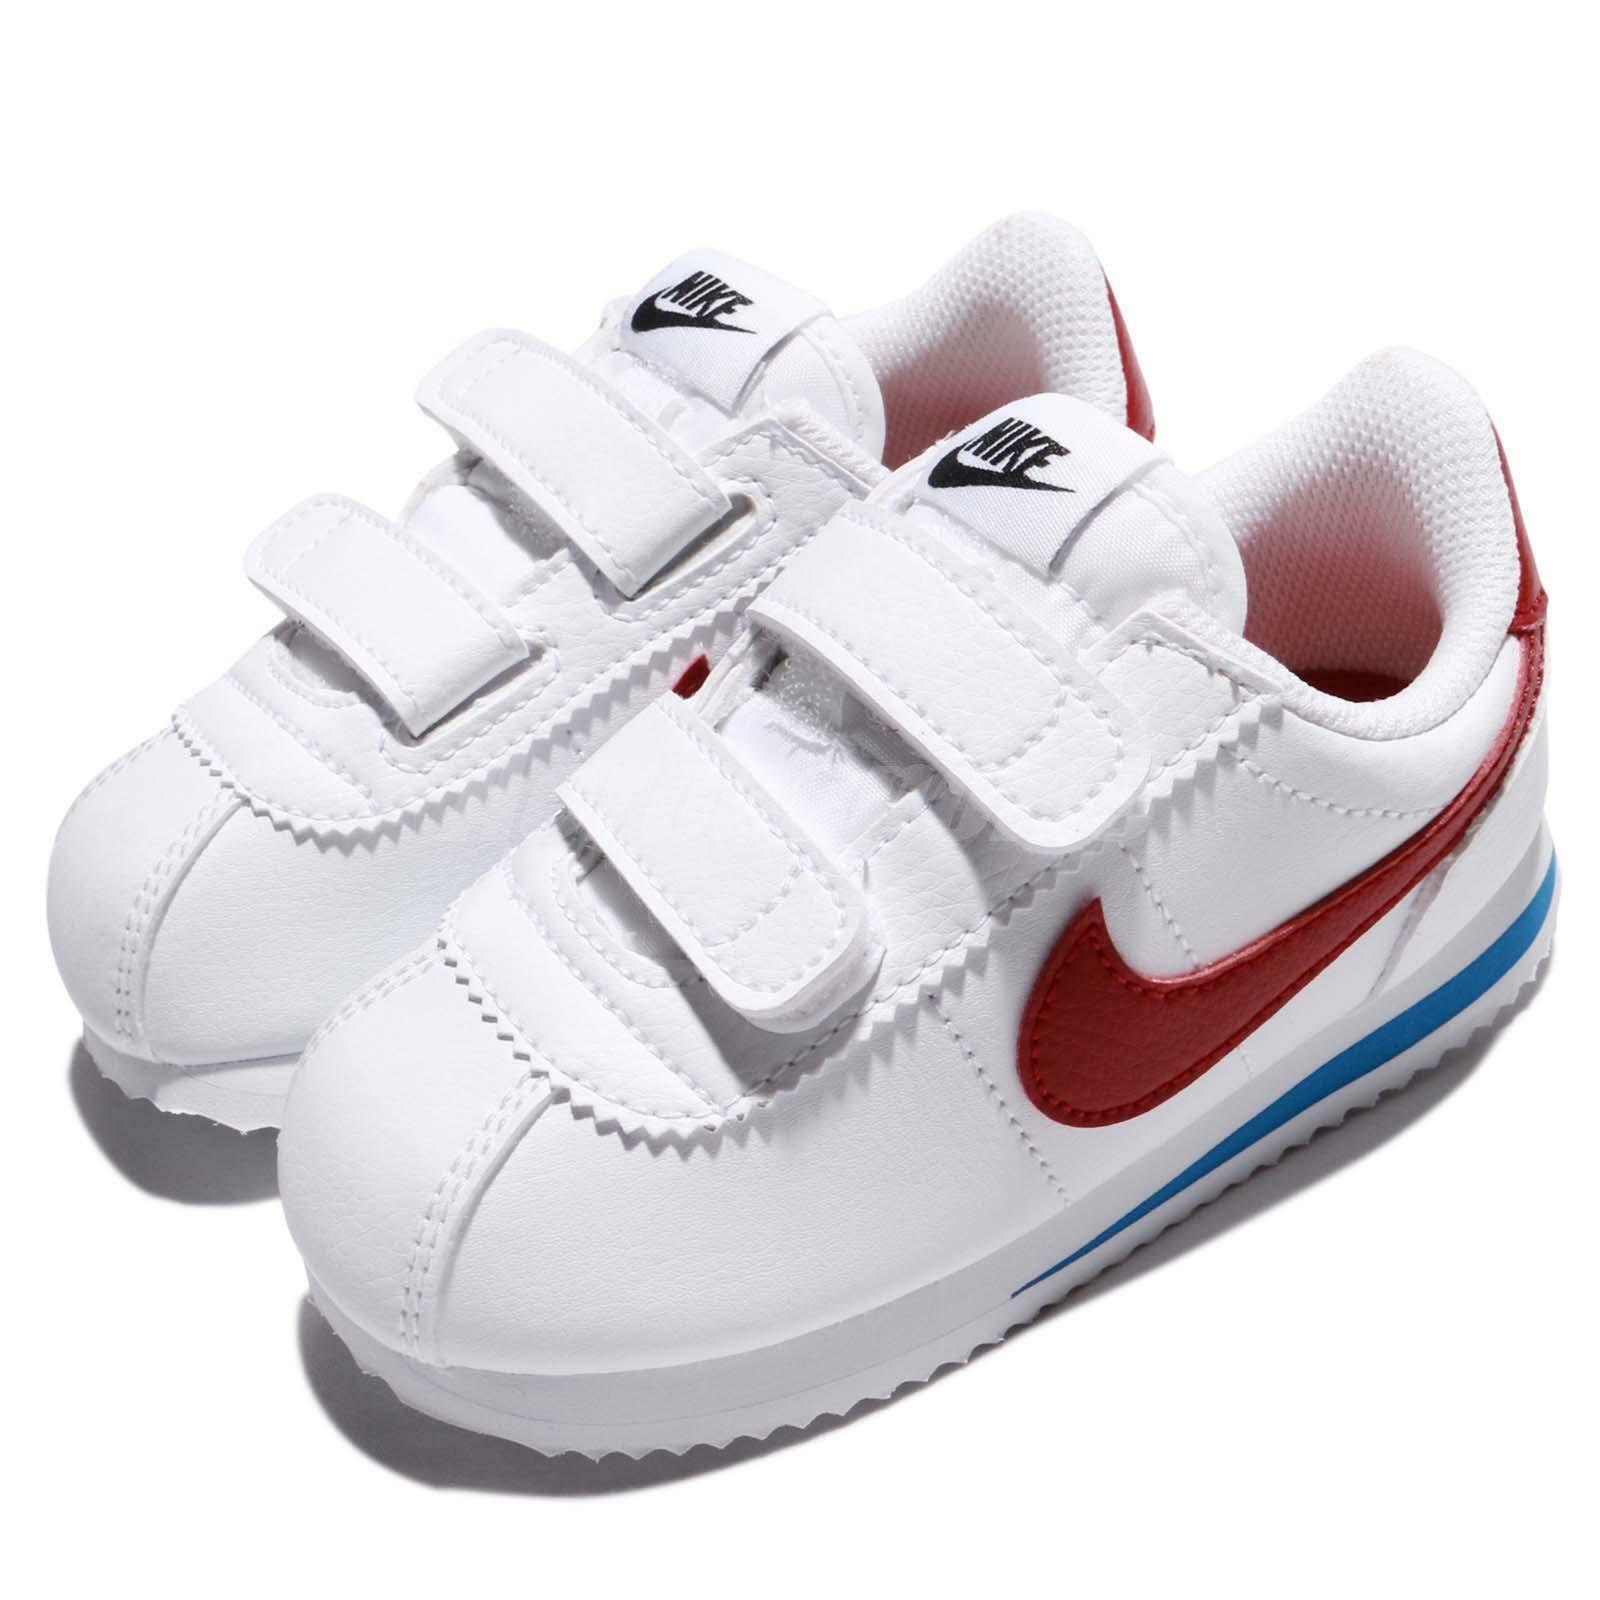 Nike Cortez Basic SL TDV OG Forrest Gump White Red Toddler I